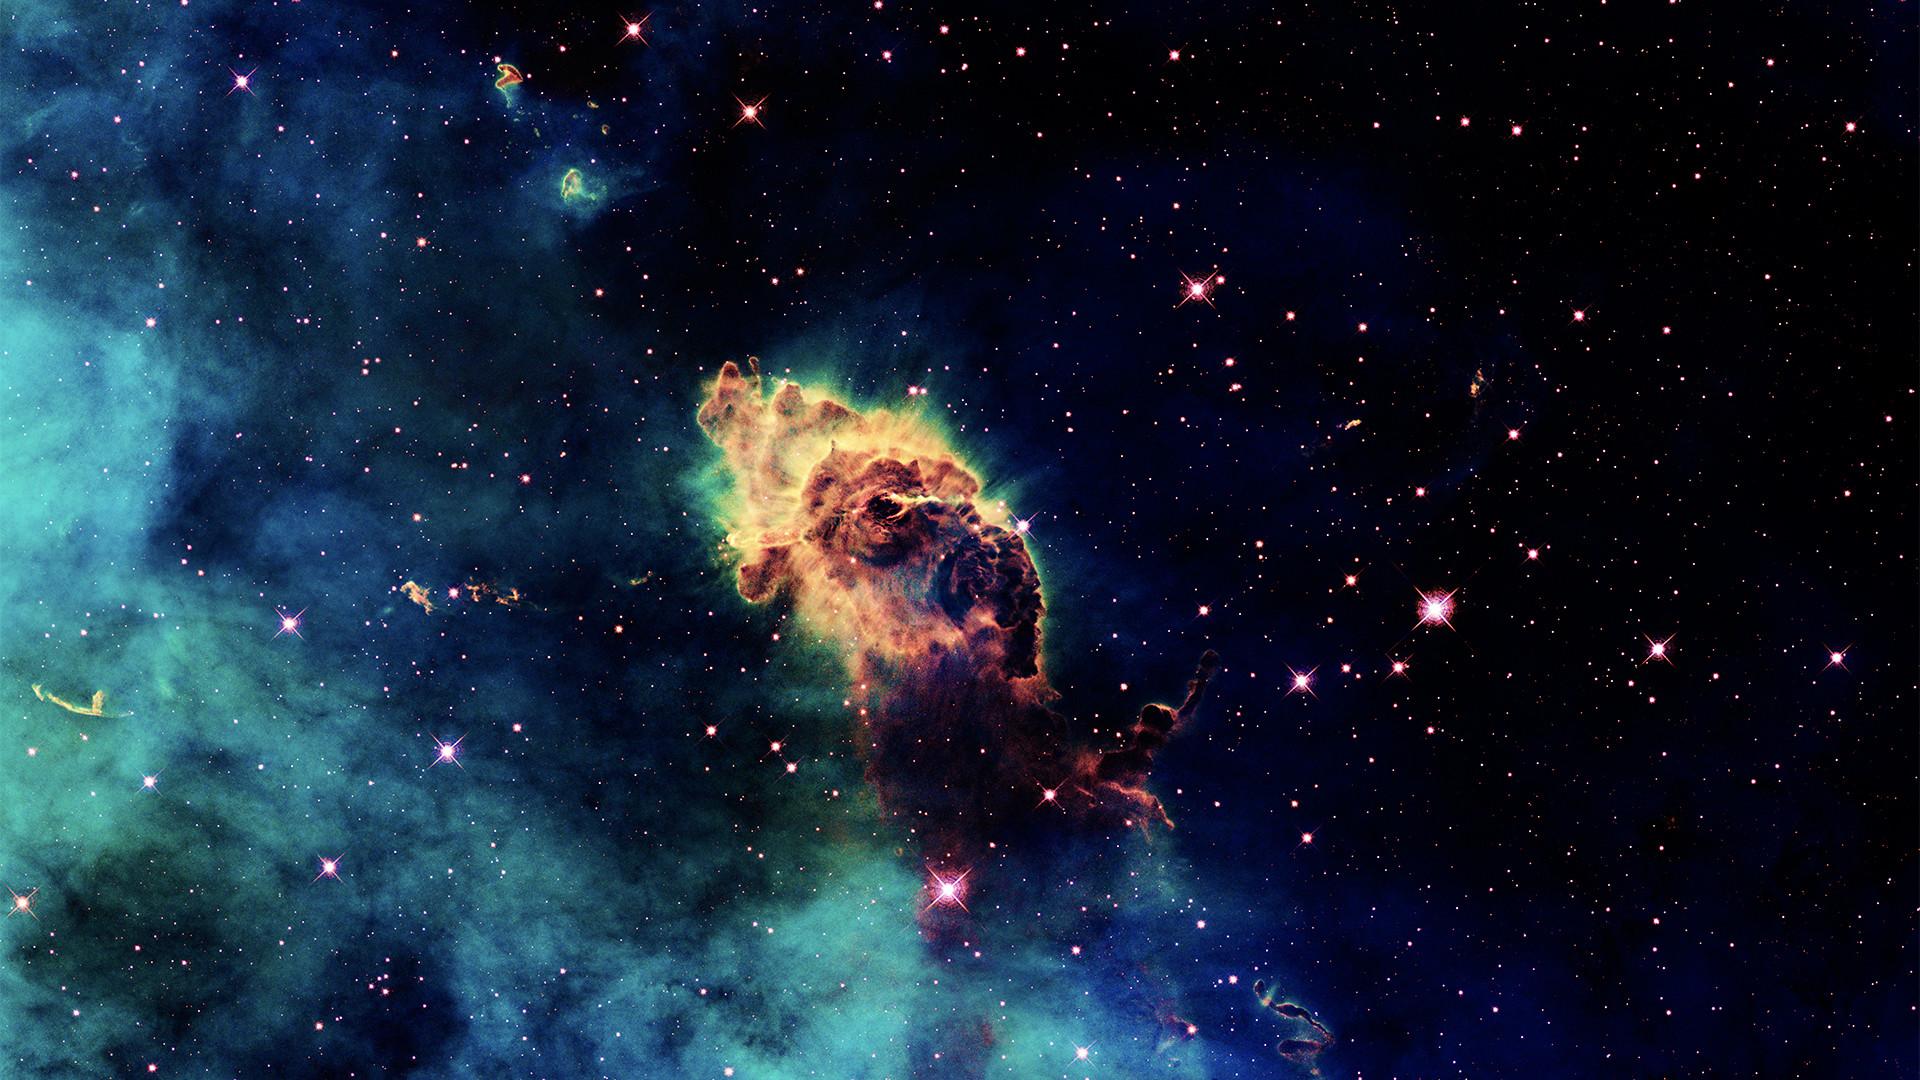 Nebula Desktop Wallpapers 1920x1080 67 Images